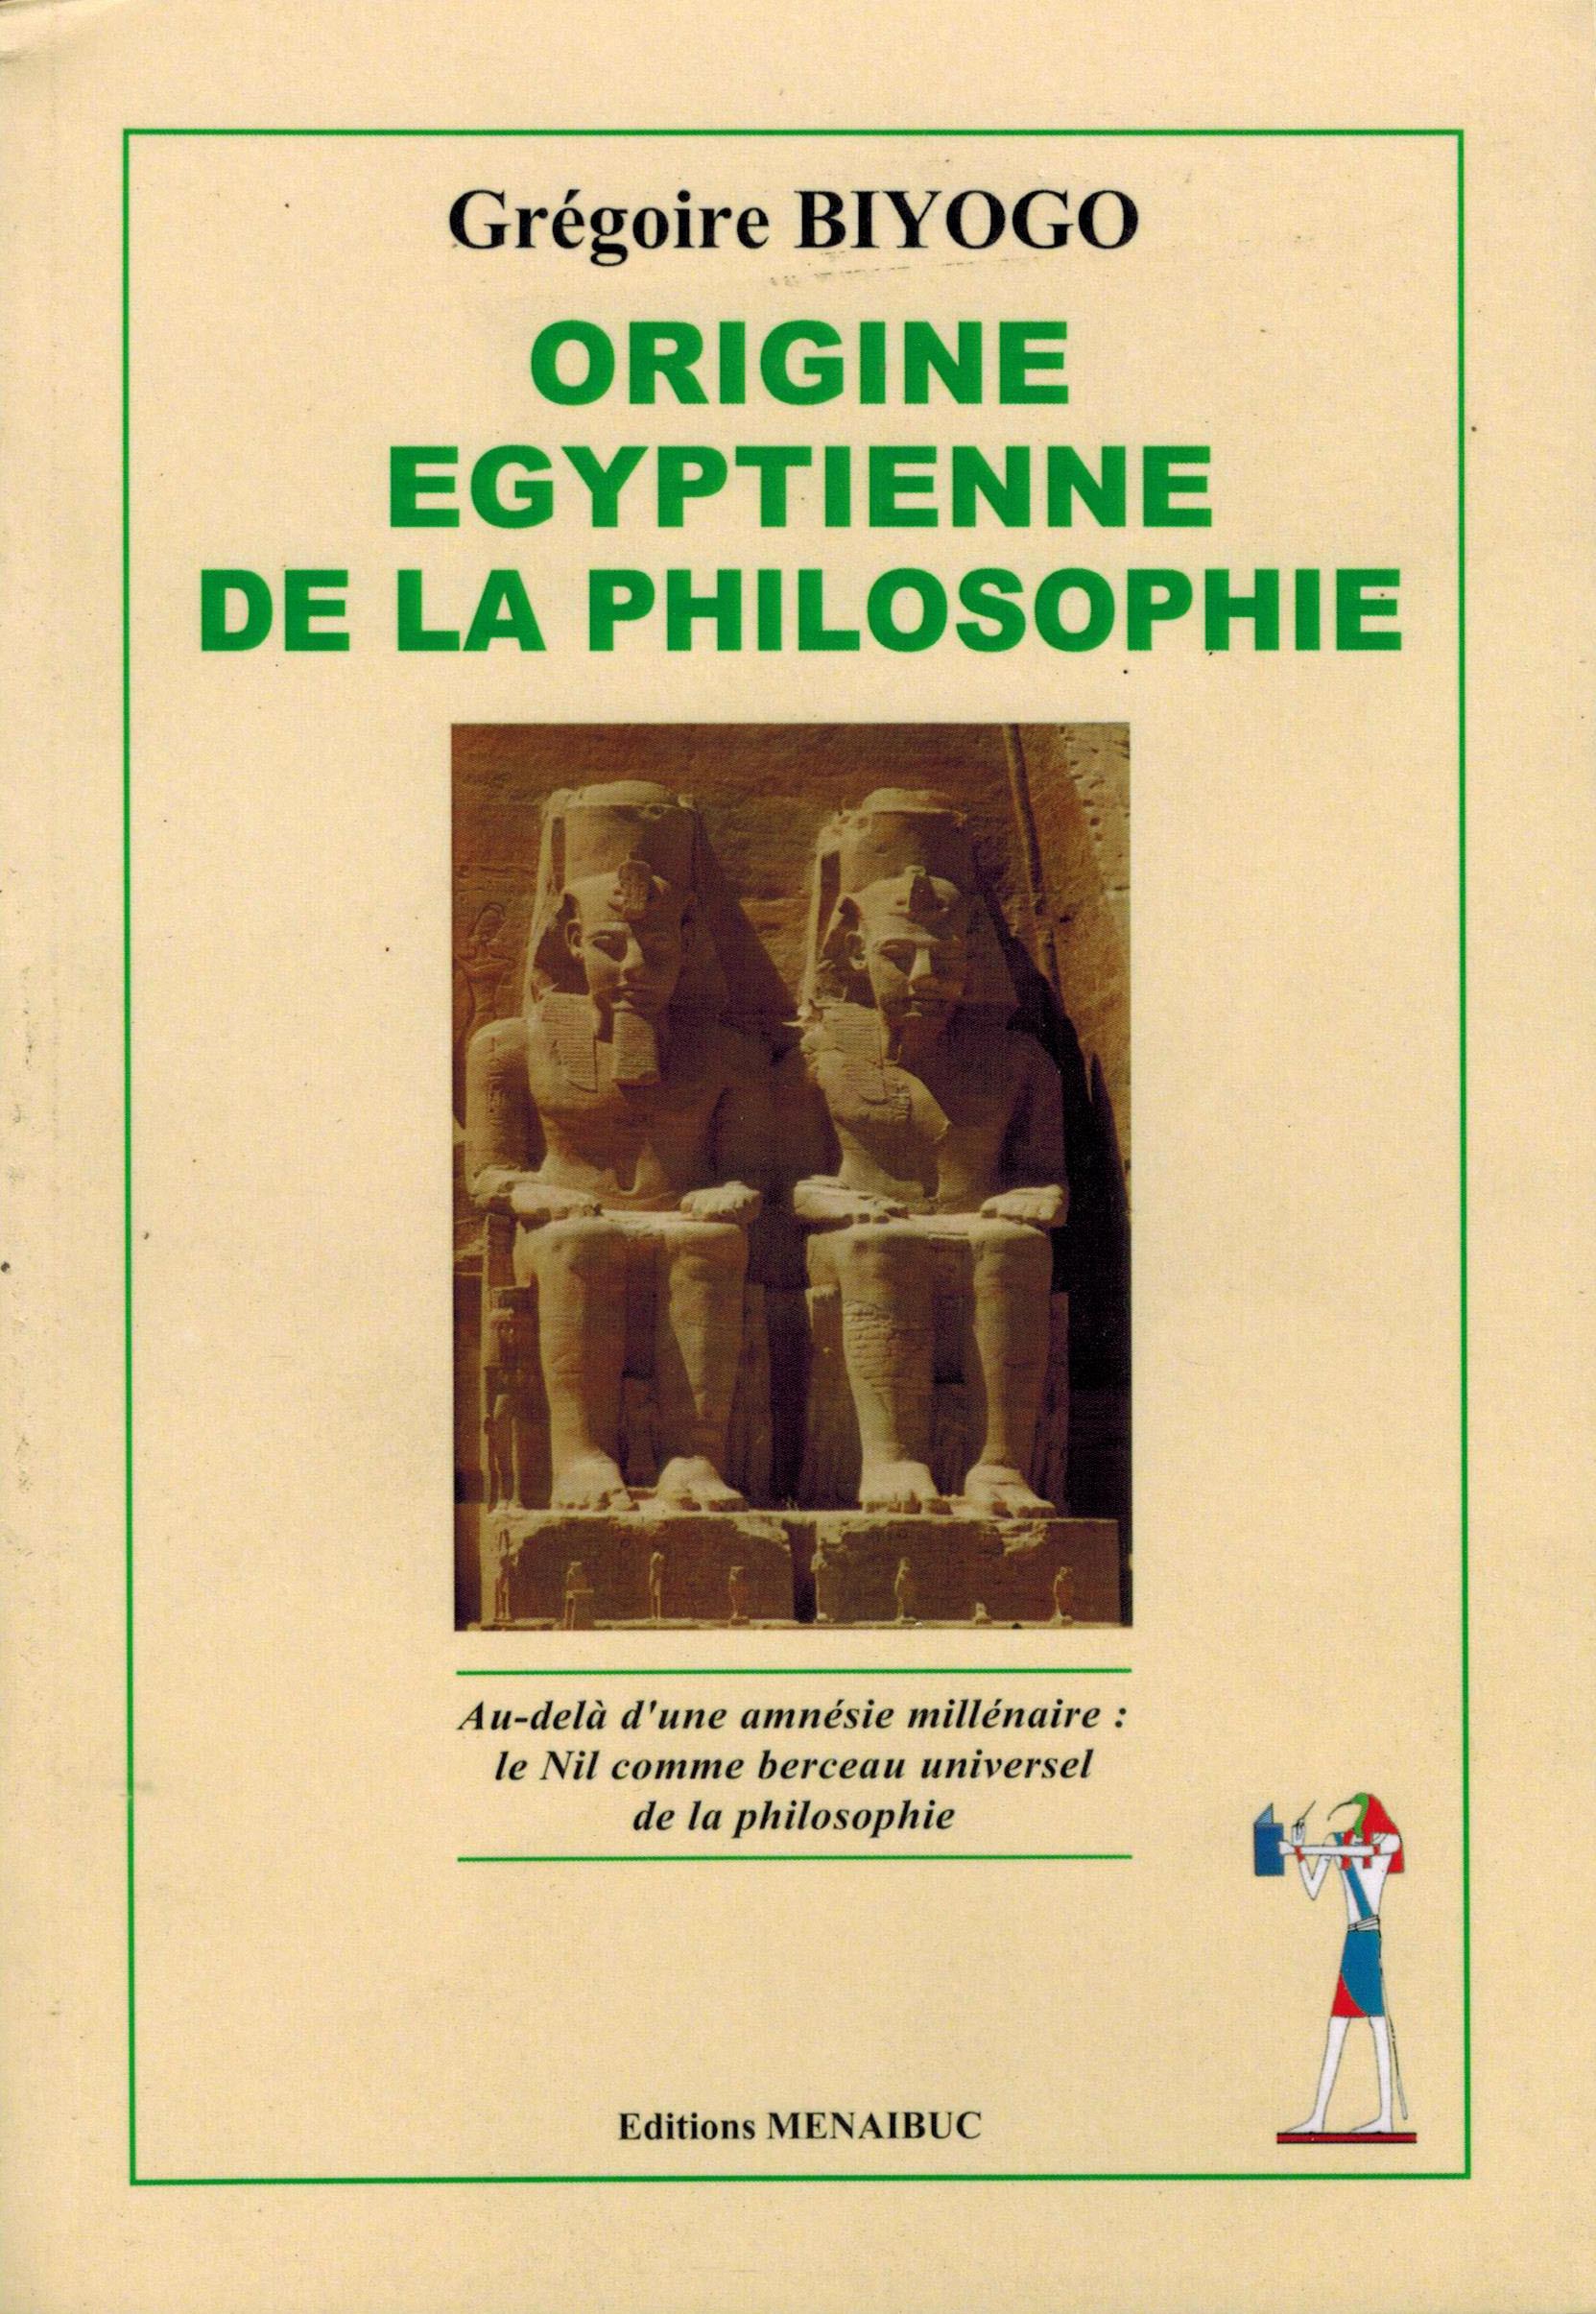 ORIGINE EGYPTIENNE DE LA PHILOSOPHIE